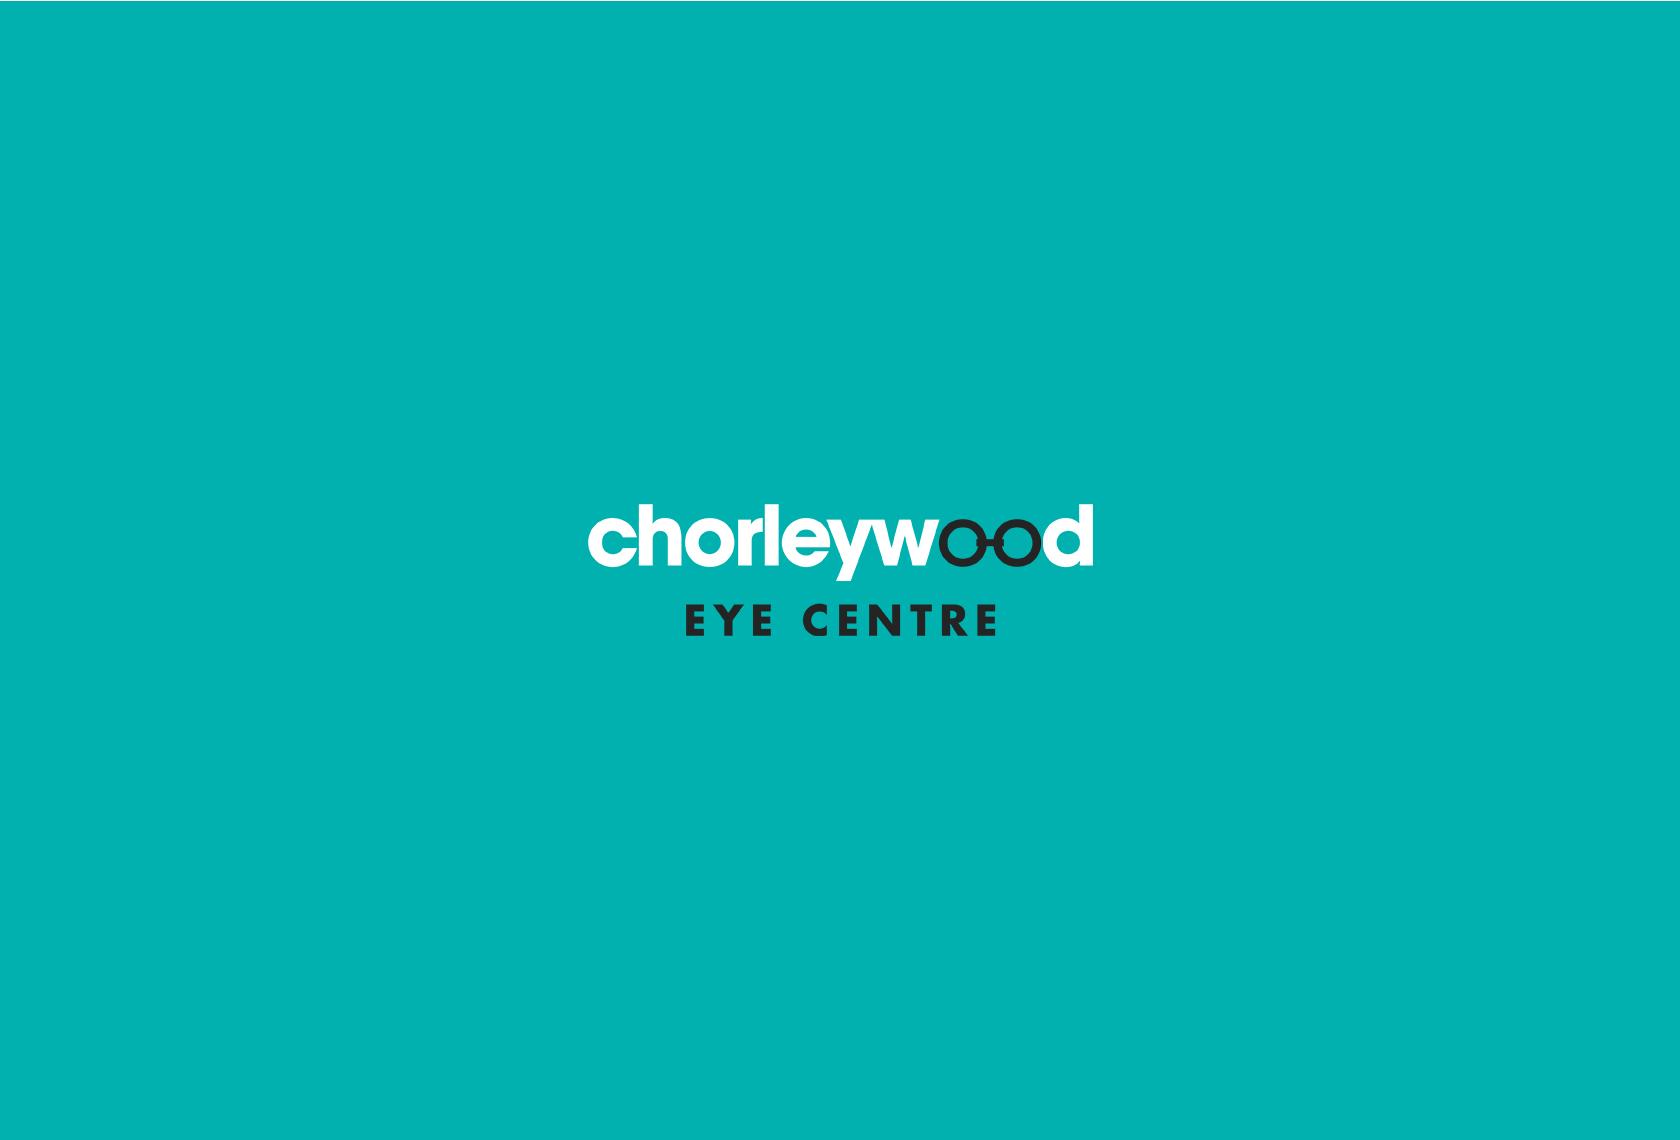 Chorleywood Logo Light - Chorleywood Eye Centre - Creative Digital